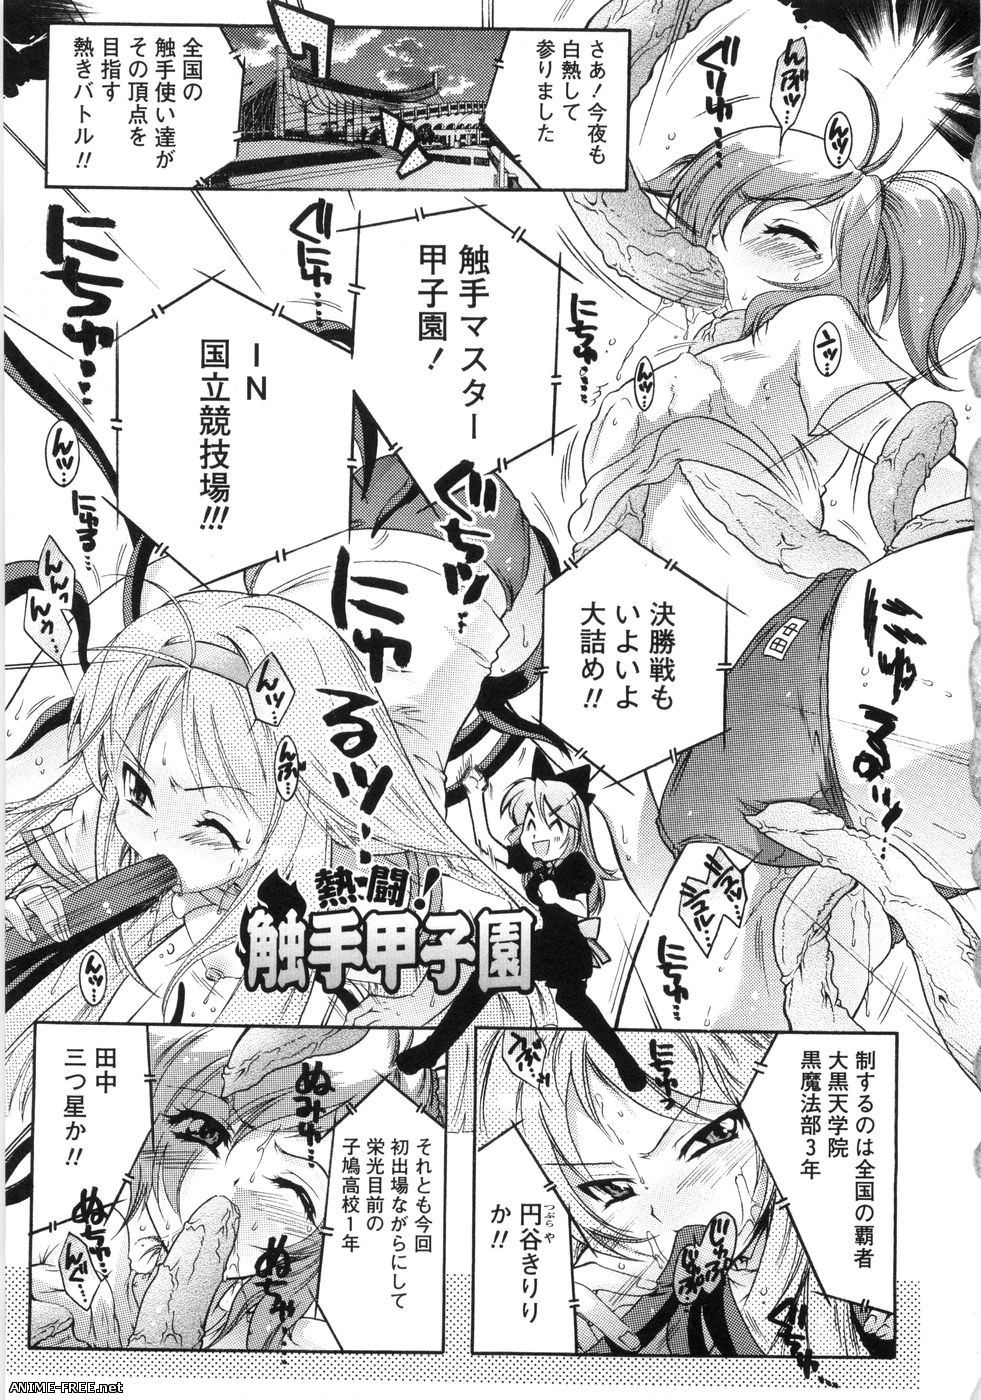 Honda Arima / Honda Koumuten - Сборник хентай манги [Cen] [ENG,JAP] Manga Hentai